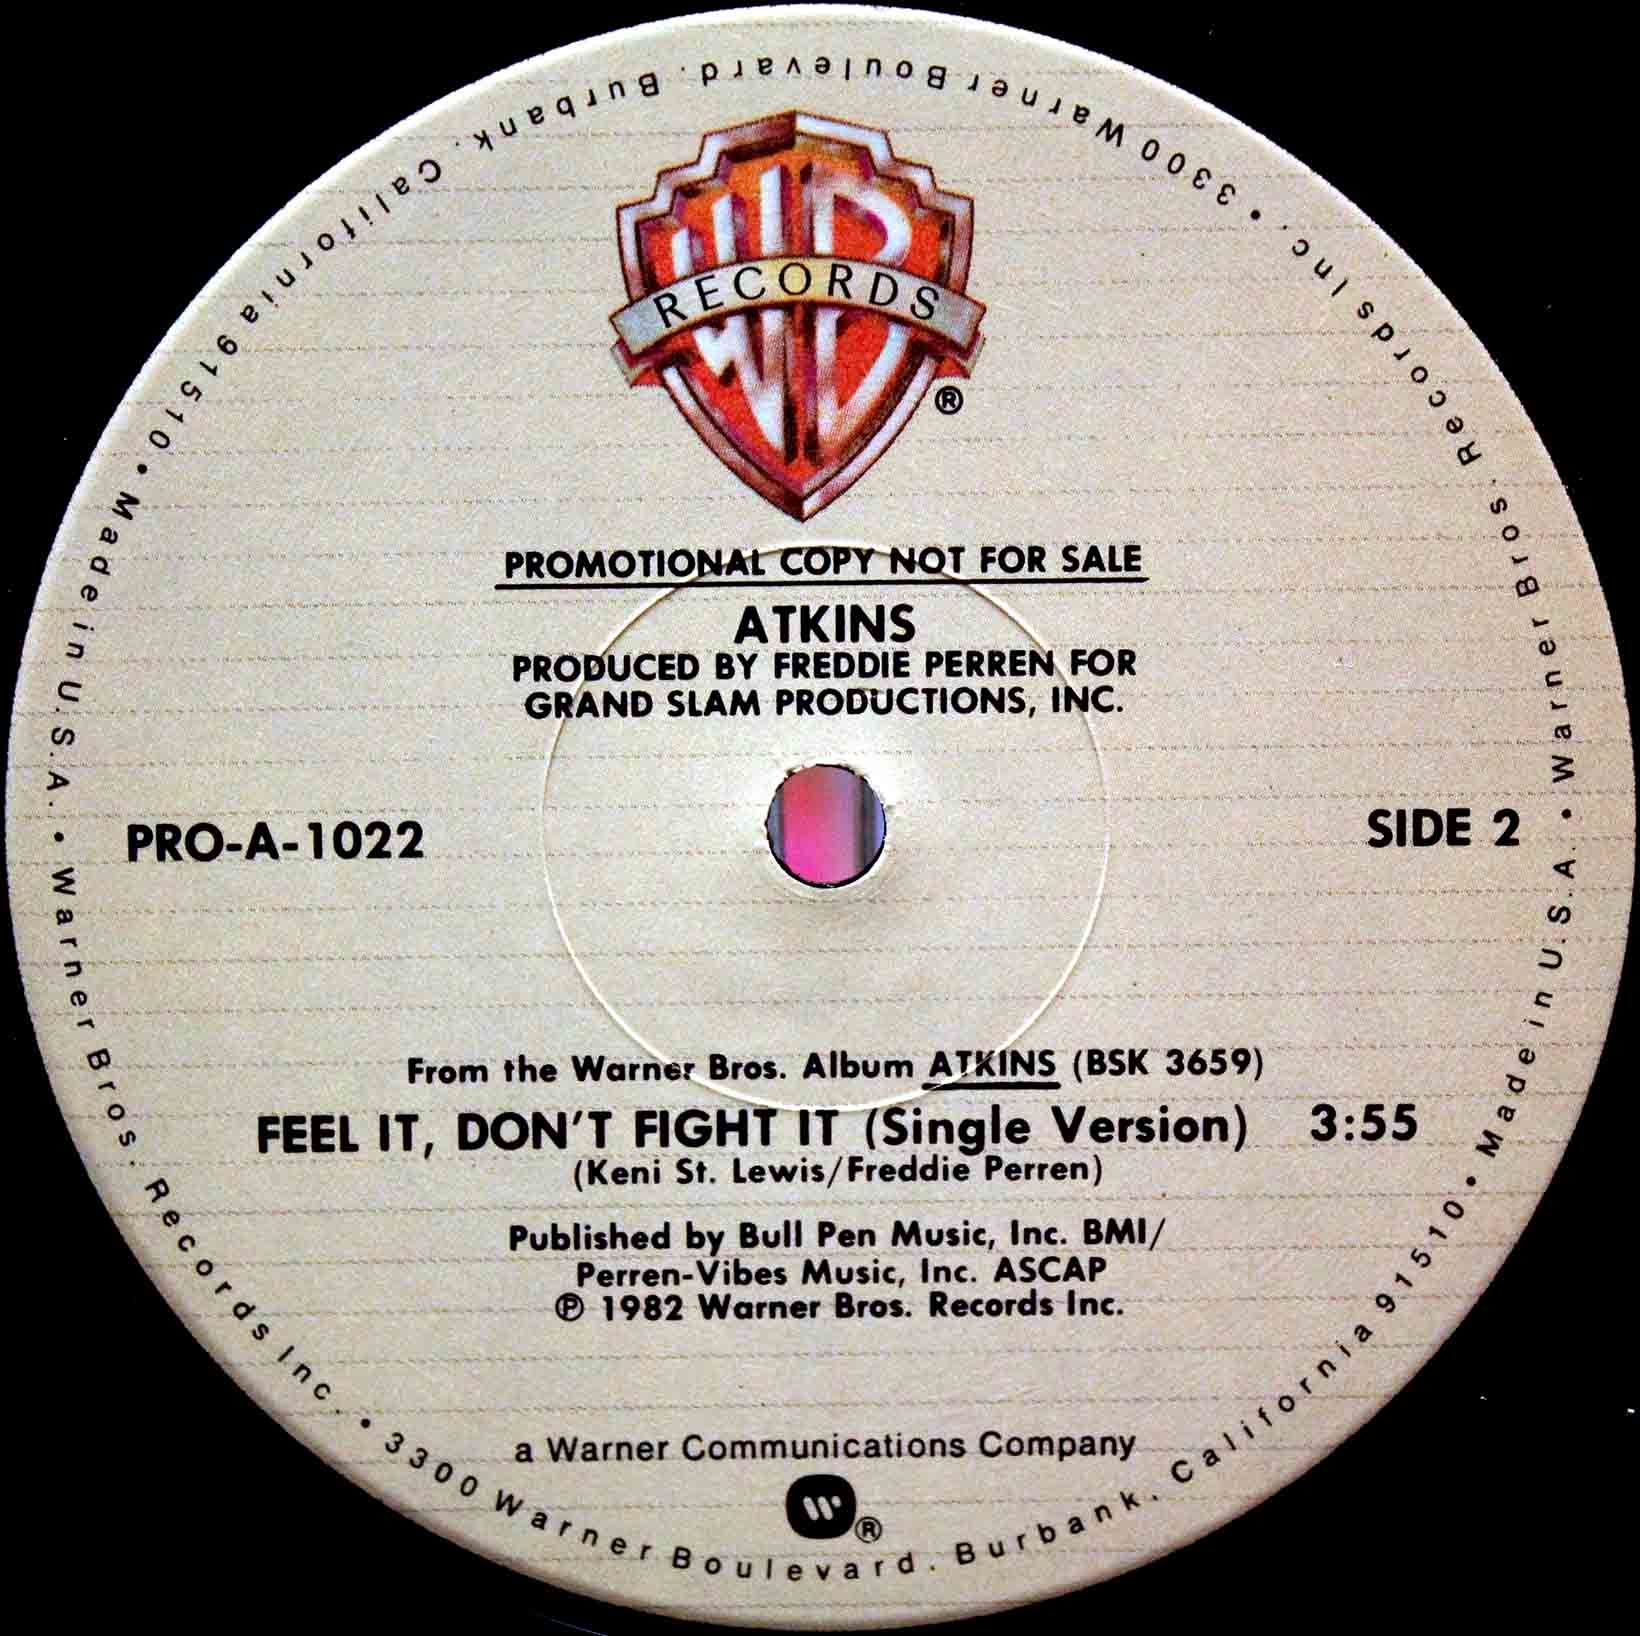 Atkins - Feel It, Dont Fight It 04